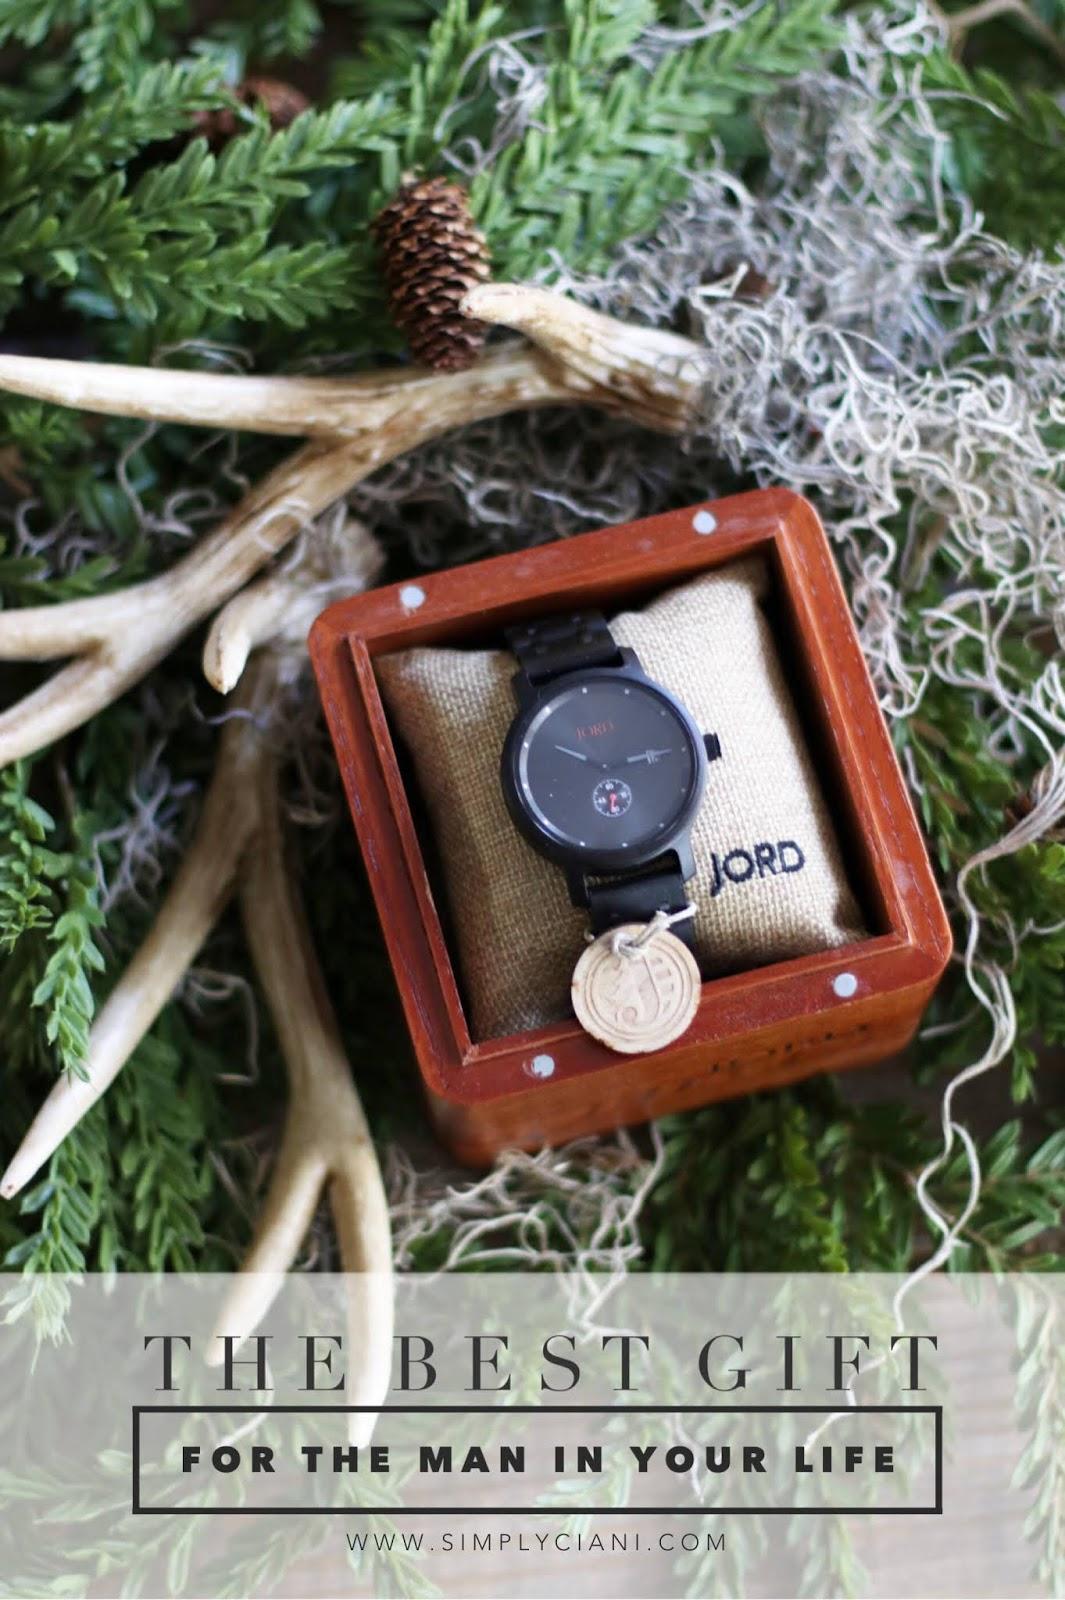 http://www.woodwatches.com/#jenniferciani